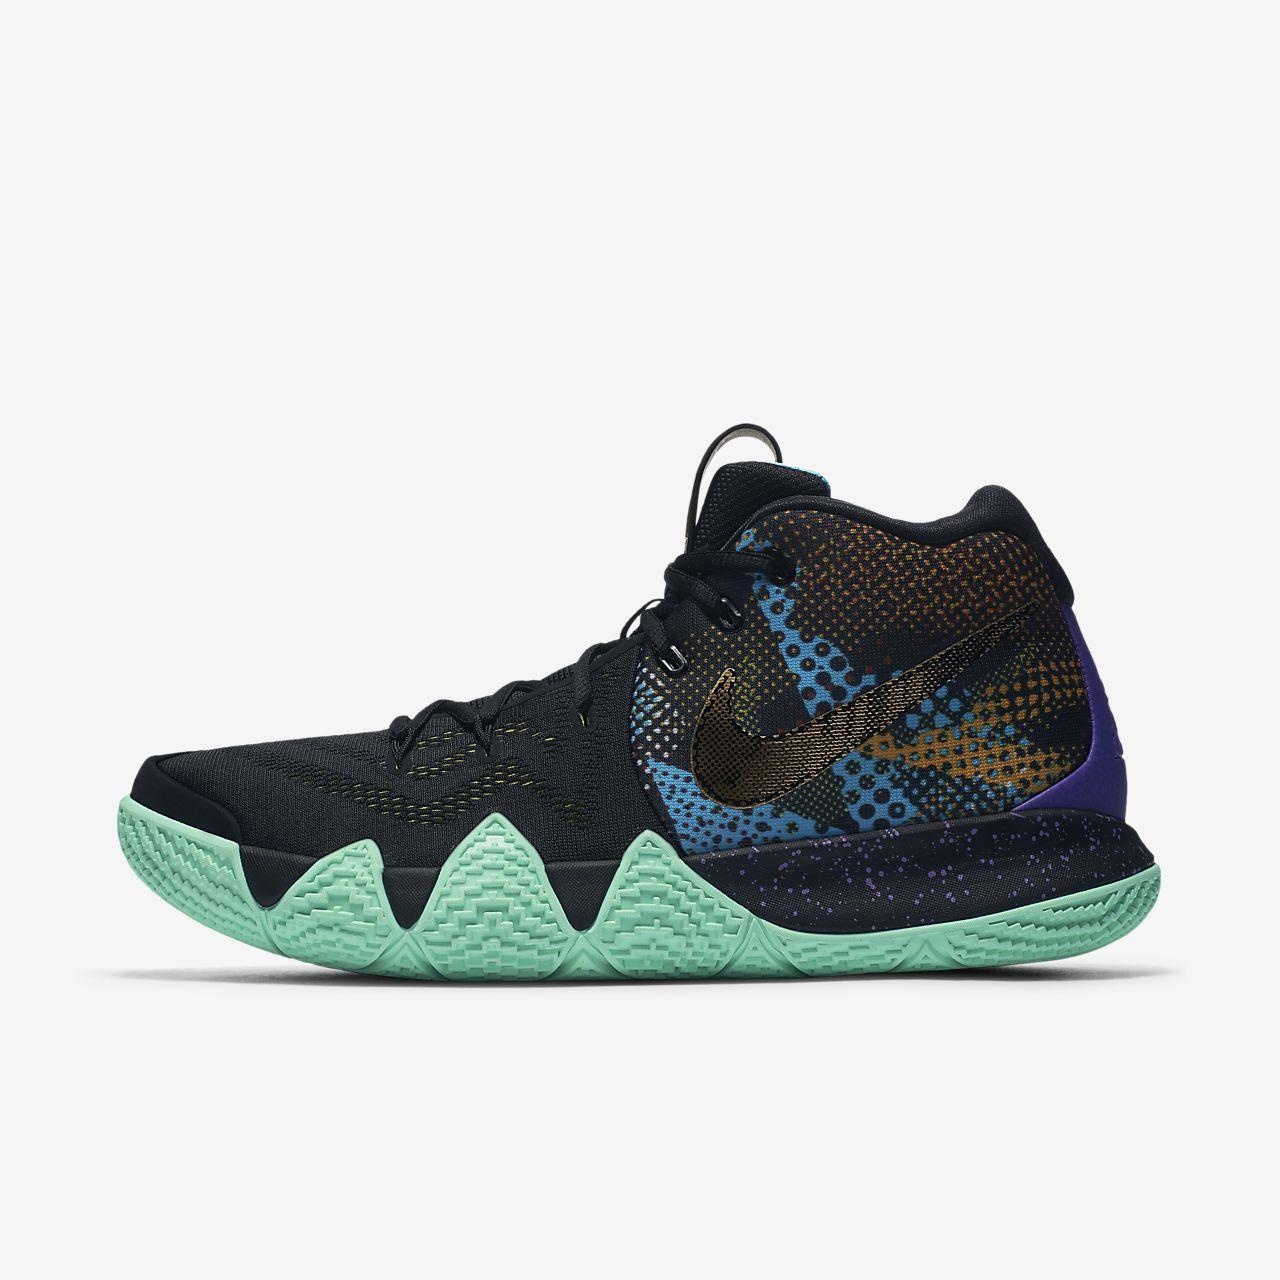 05ec8513ea5ead Kyrie 4 Basketball Shoe. Nike.com BG